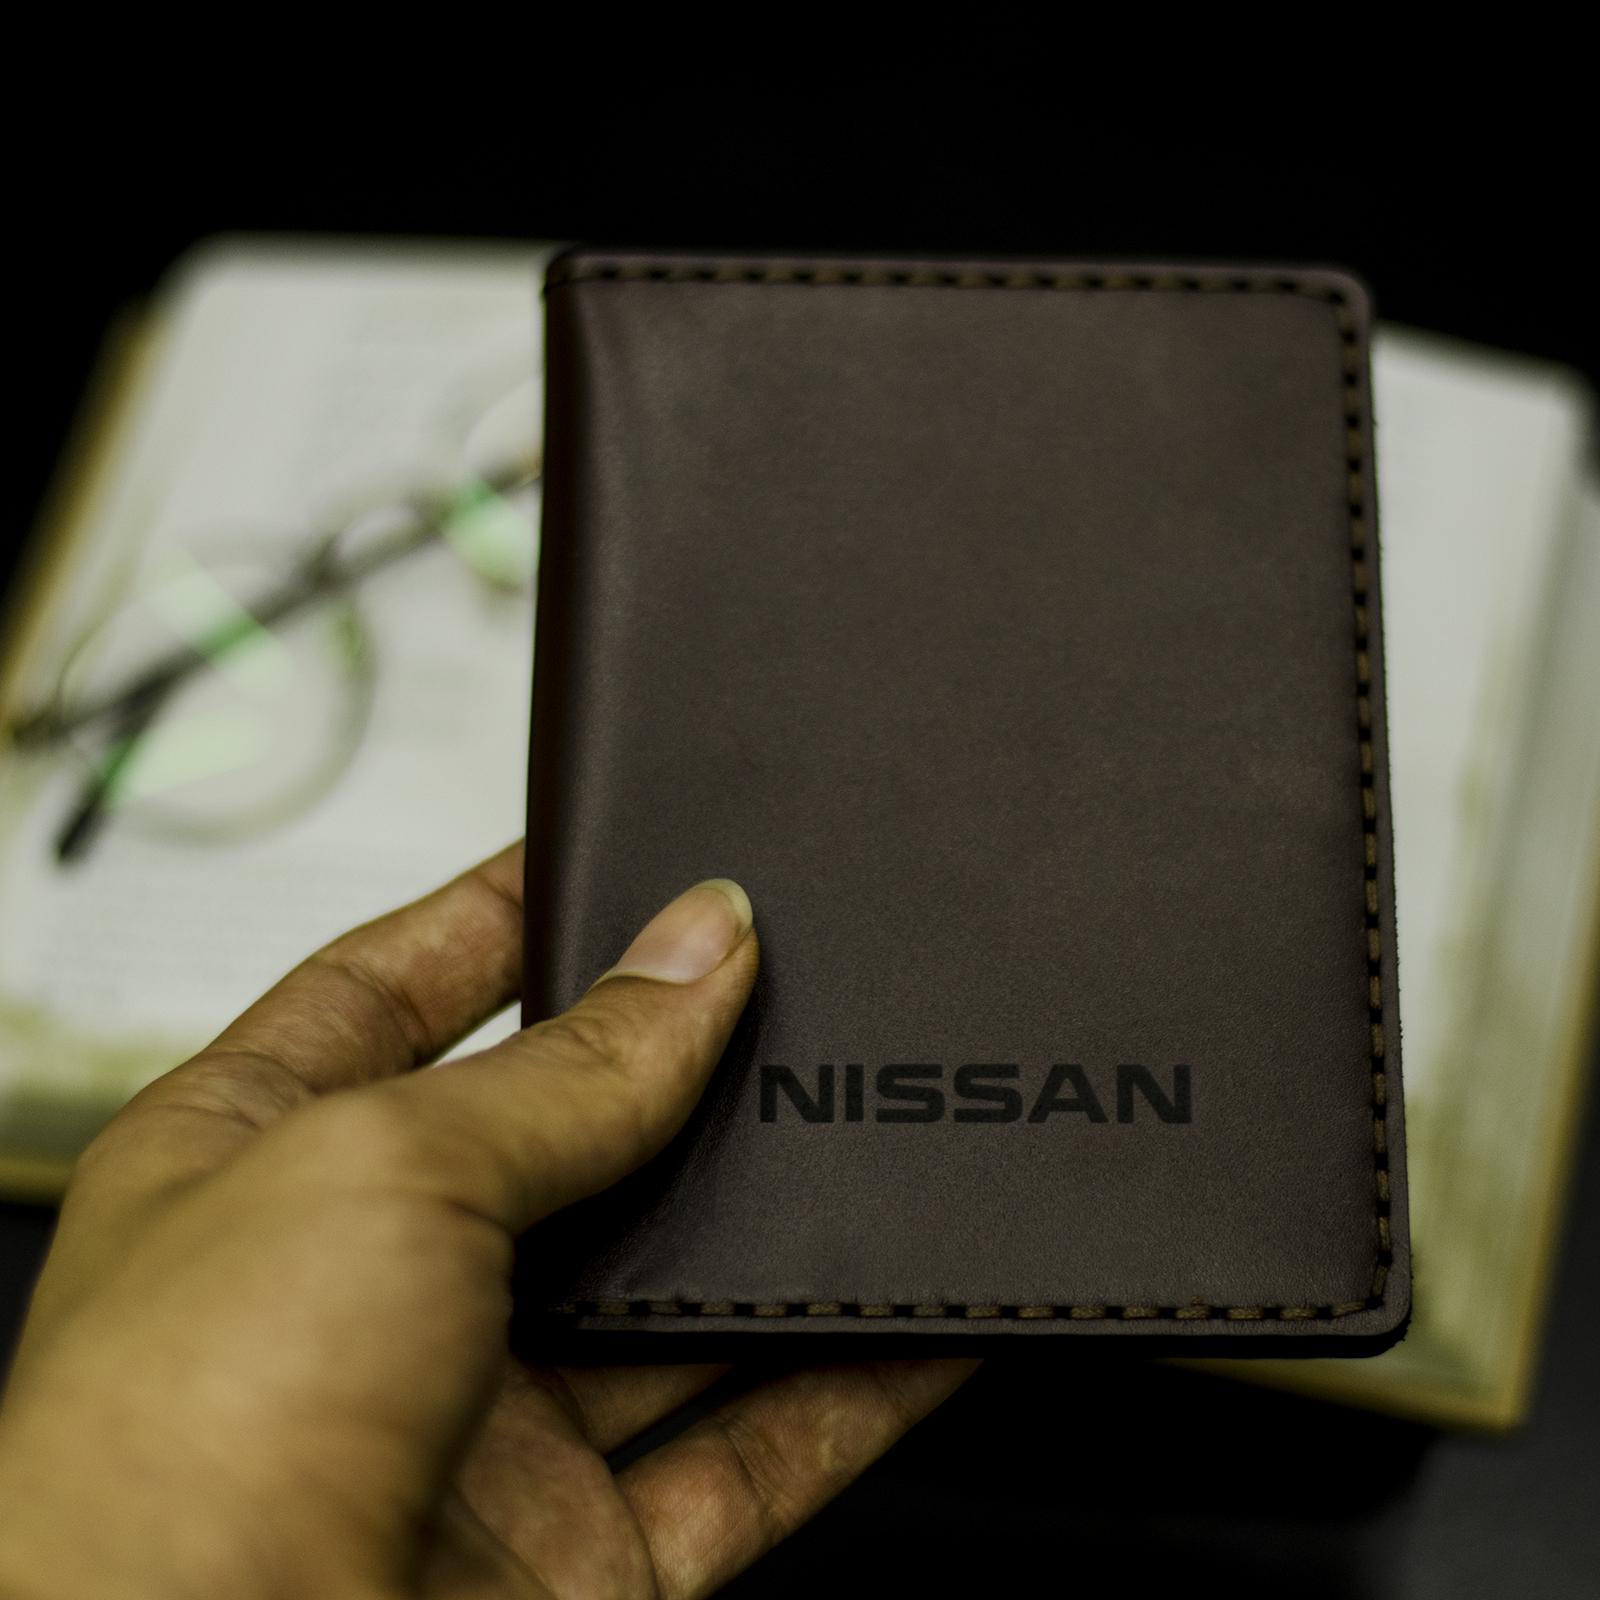 کیف مدارک مردانه چرمینه اسپرت طرح نیسان کد 43024-B main 1 6